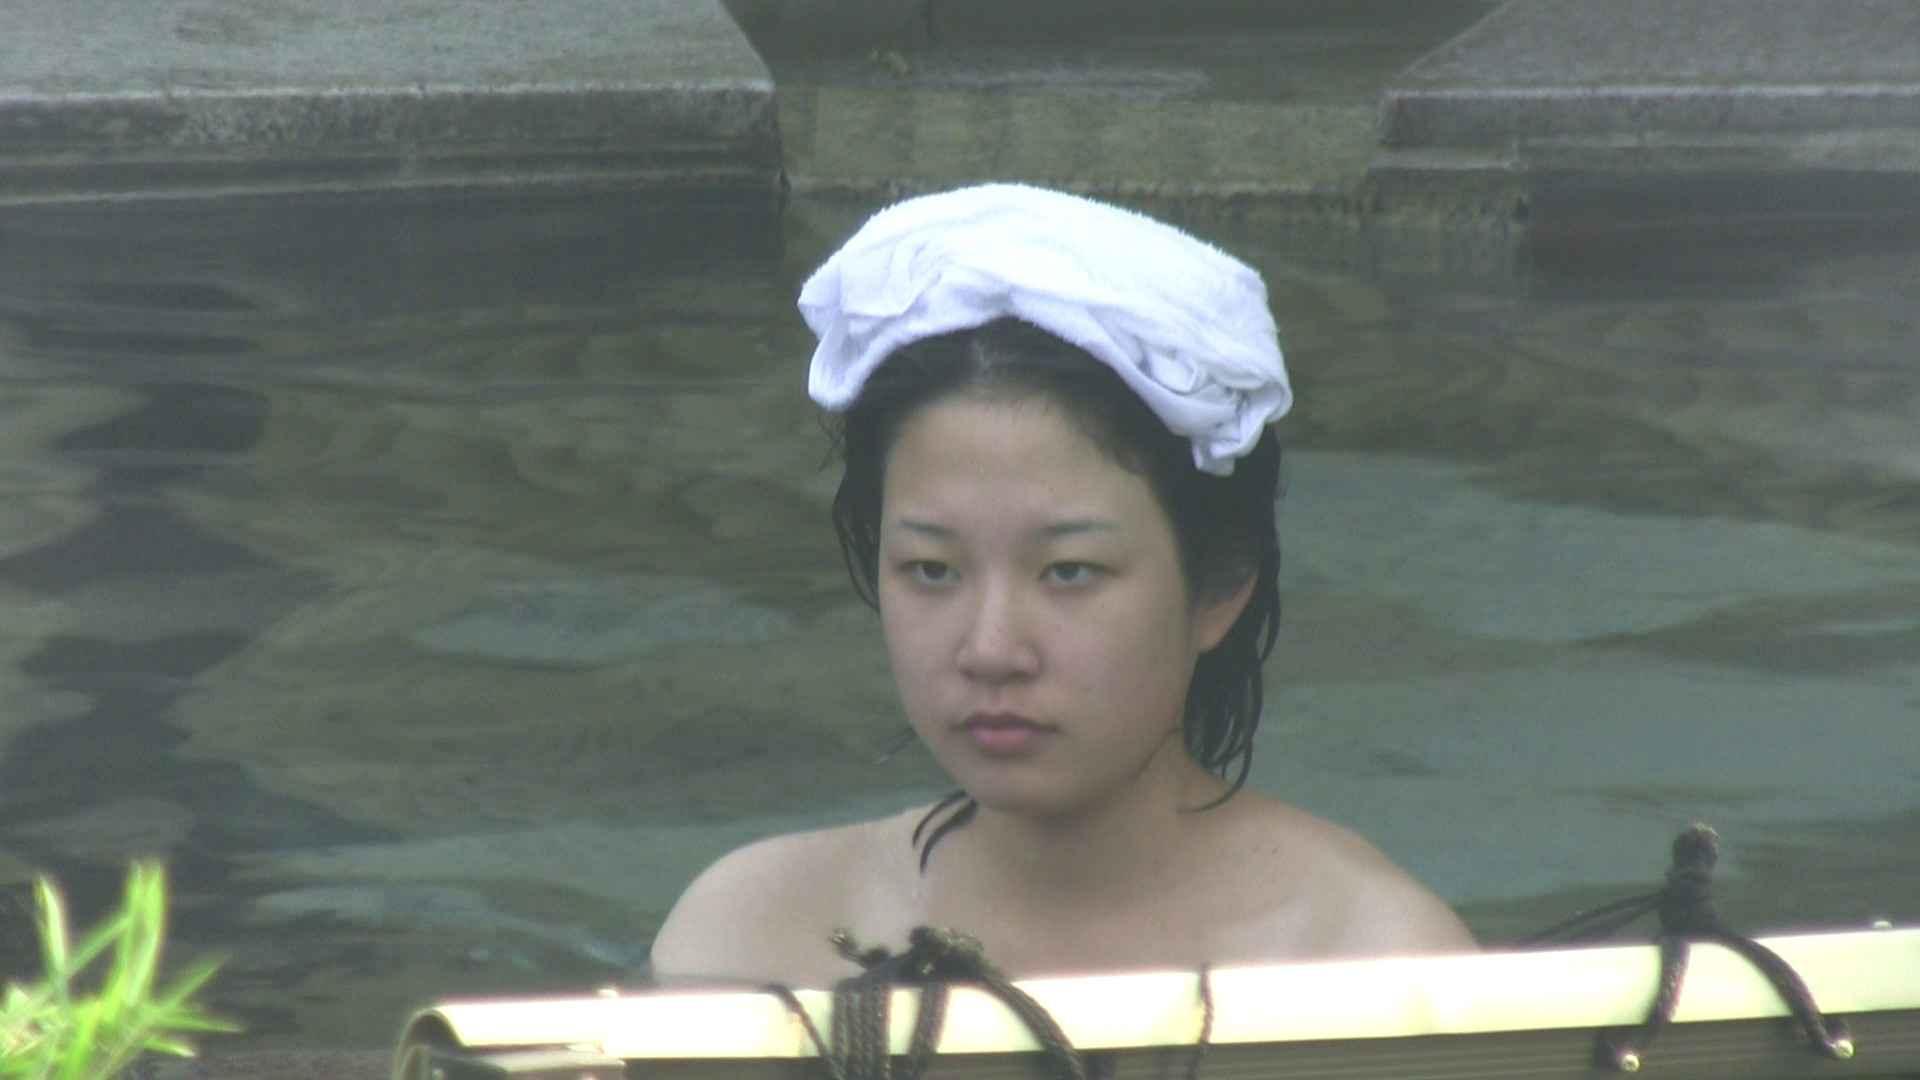 Aquaな露天風呂Vol.172 盗撮映像  113Pix 42